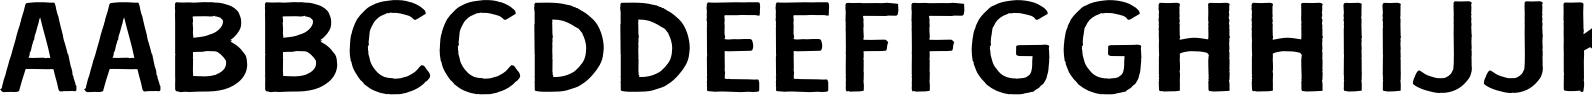 Badgear Font Duo